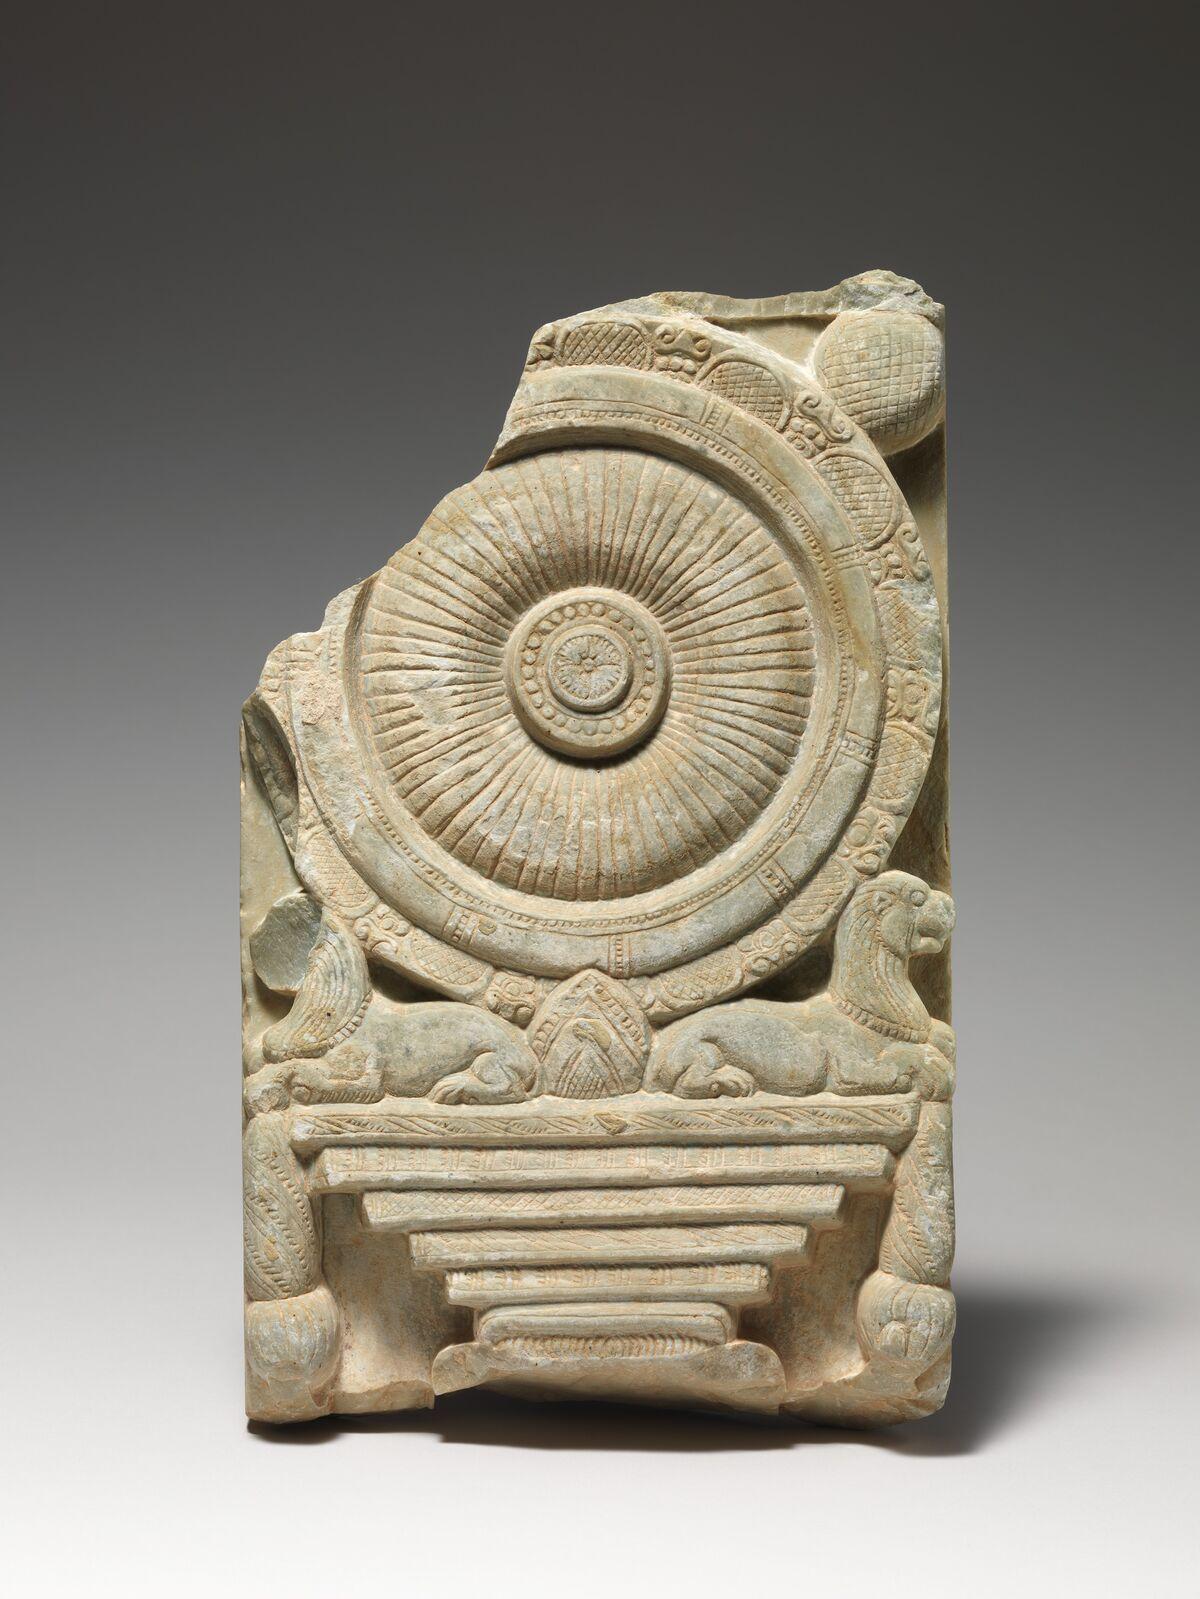 """Dharmachakrastambha"" (Buddhist Wheel of the Law Pillar) Relief, 2nd–3rd century A,D. India (probably Nagarjunakonda, Andhra Pradesh). Courtesy of The Metropolitan Museum of Art."